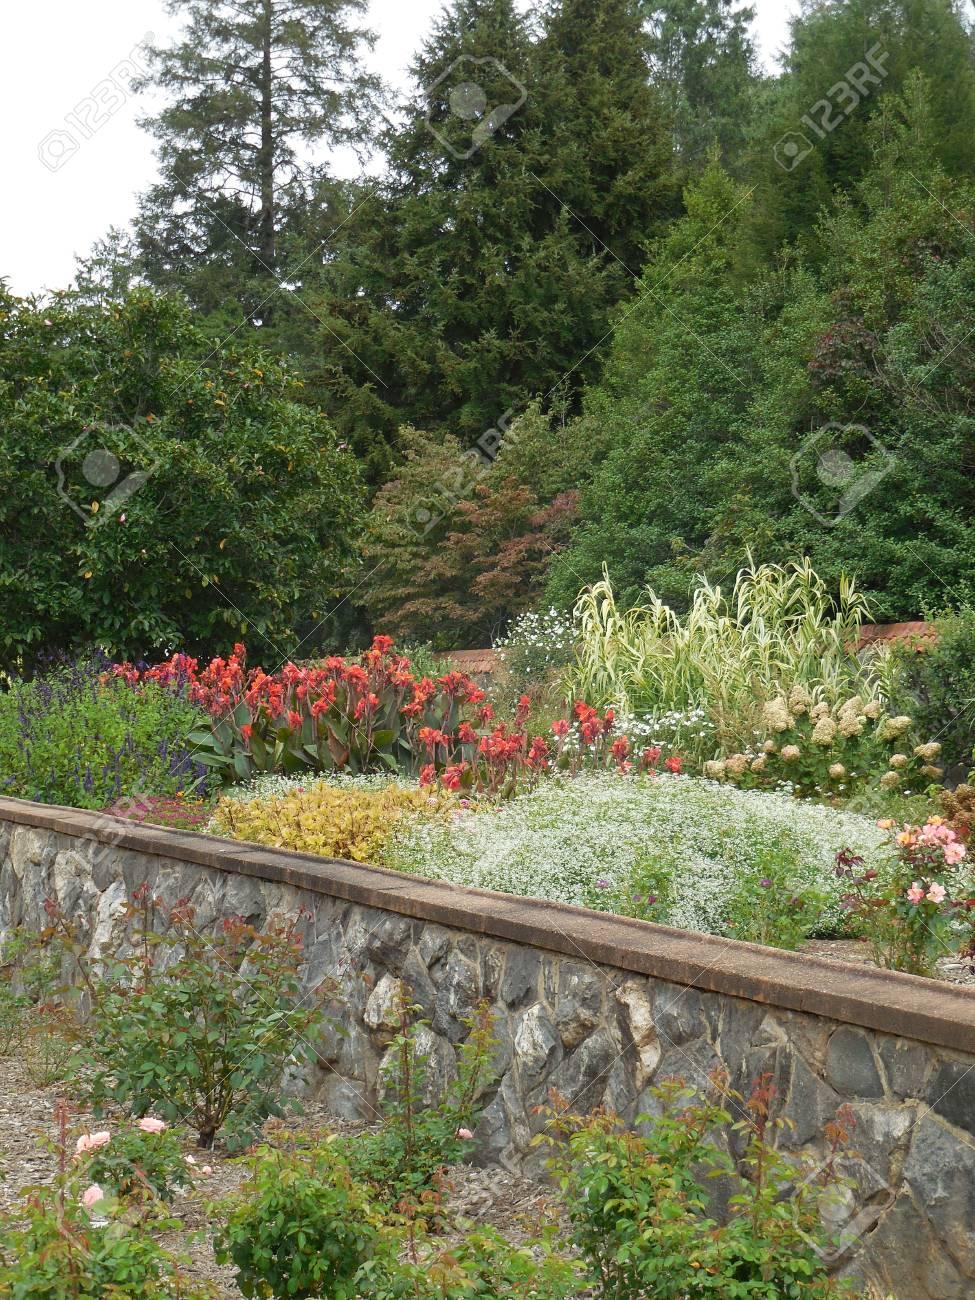 Flower garden Stock Photo - 88603401